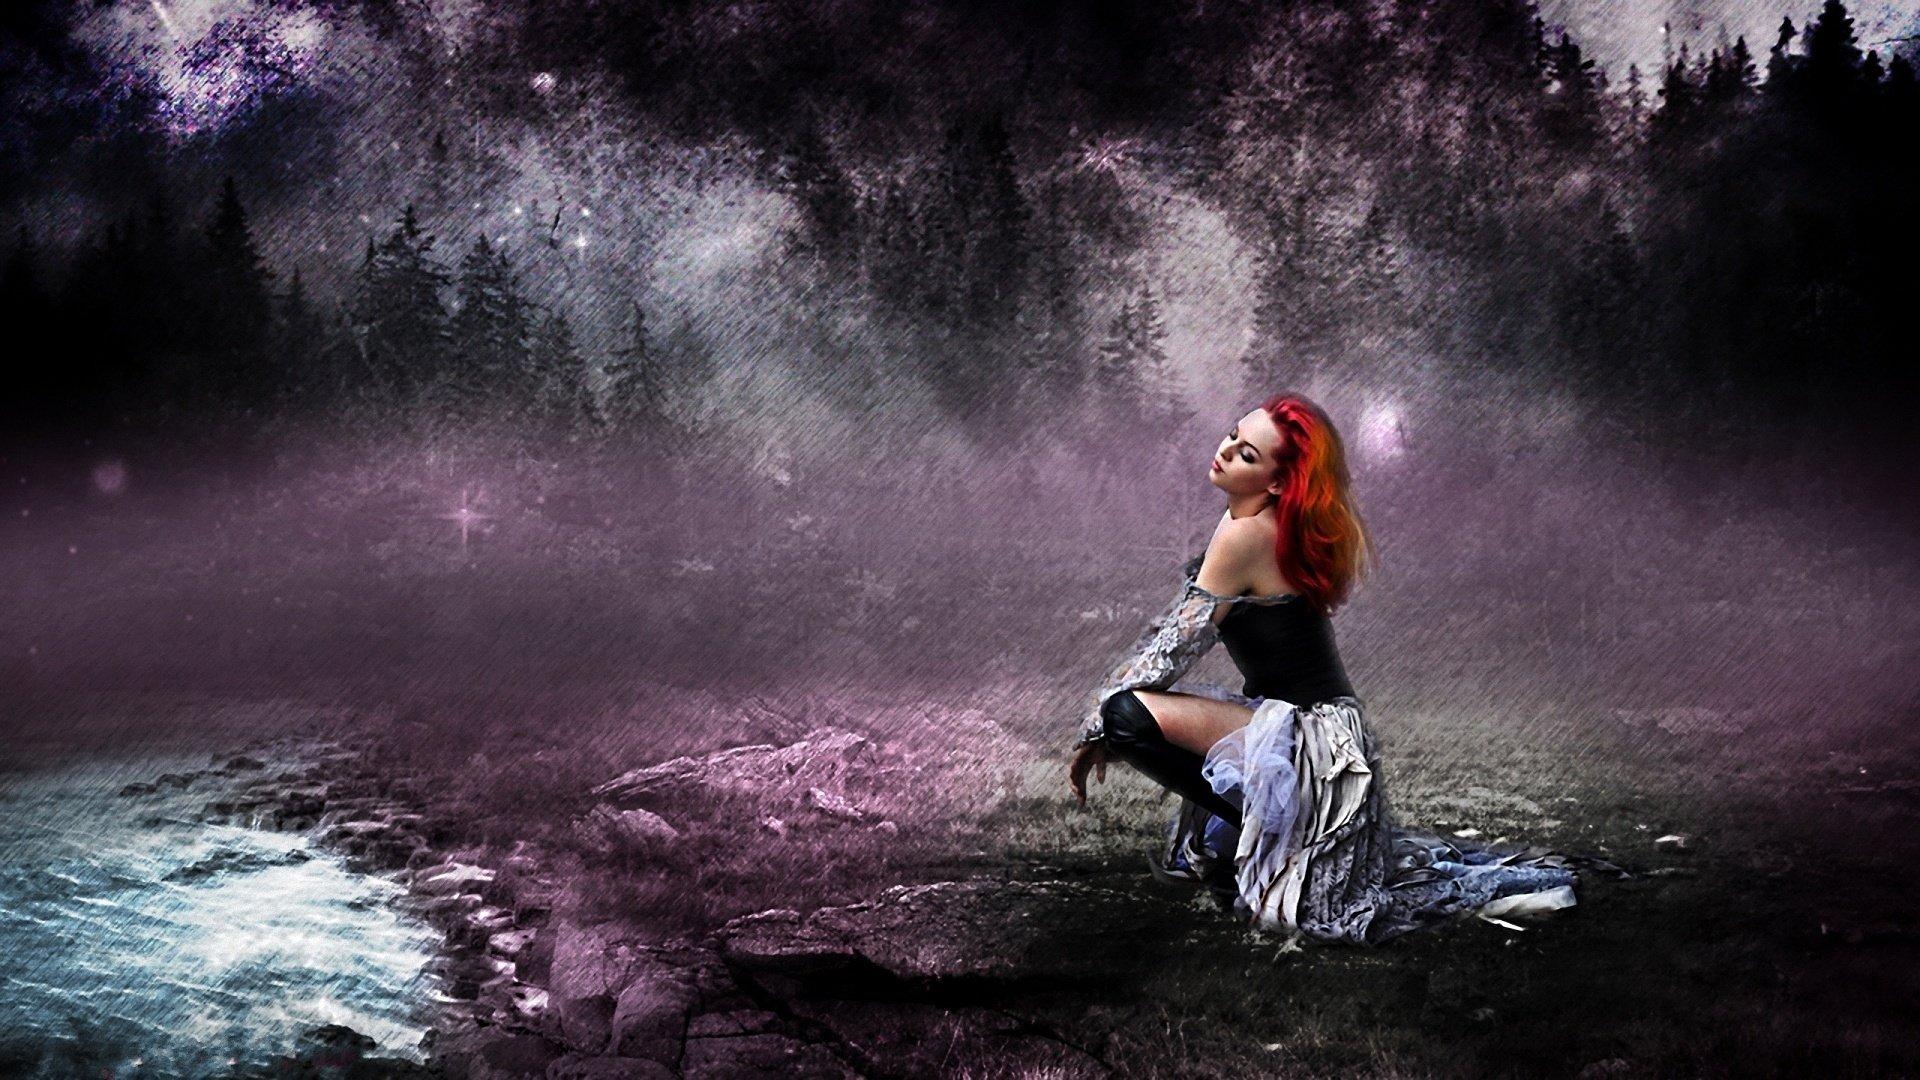 A Beautiful Women Hd Wallpaper Background Image 1920x1080 Id